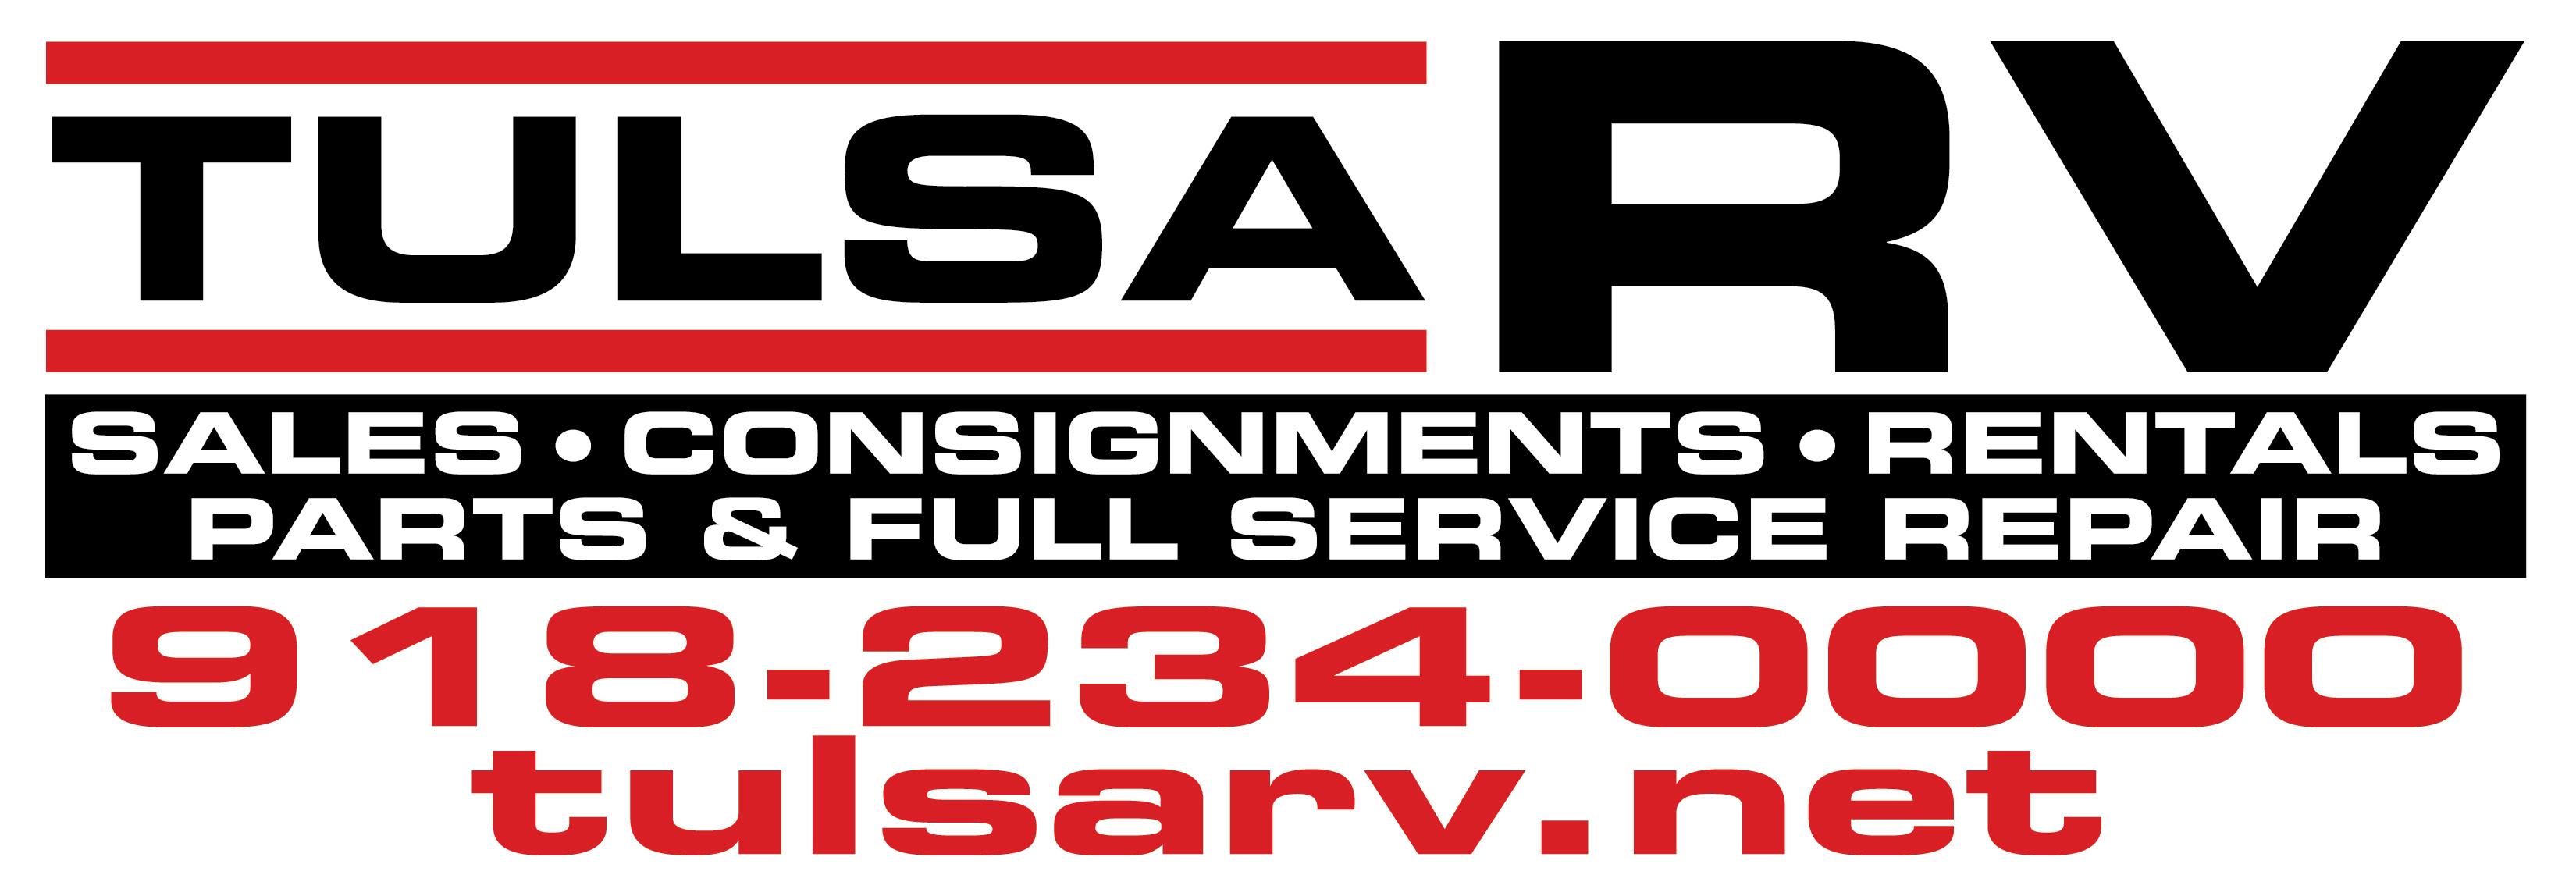 Rv Sales Tulsa >> Tulsa Rv Sales Service And Parts 20213 E Admiral Pl Catoosa Ok